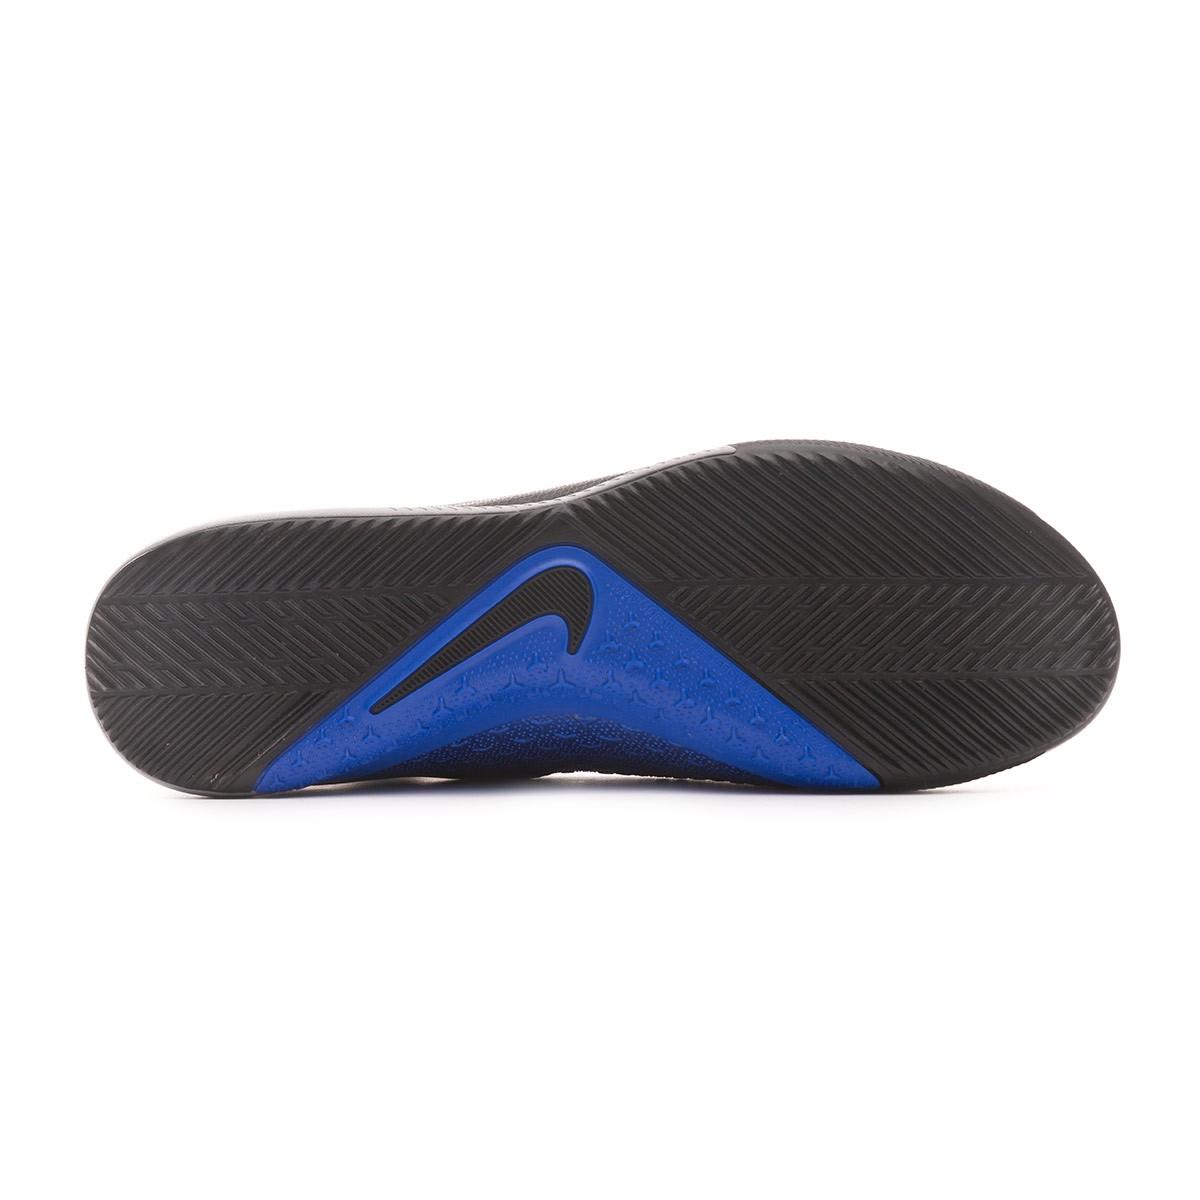 20f339898eb Futsal Boot Nike Phantom Vision Academy DF IC Black-Metallic silver-Racer  blue - Football store Fútbol Emotion